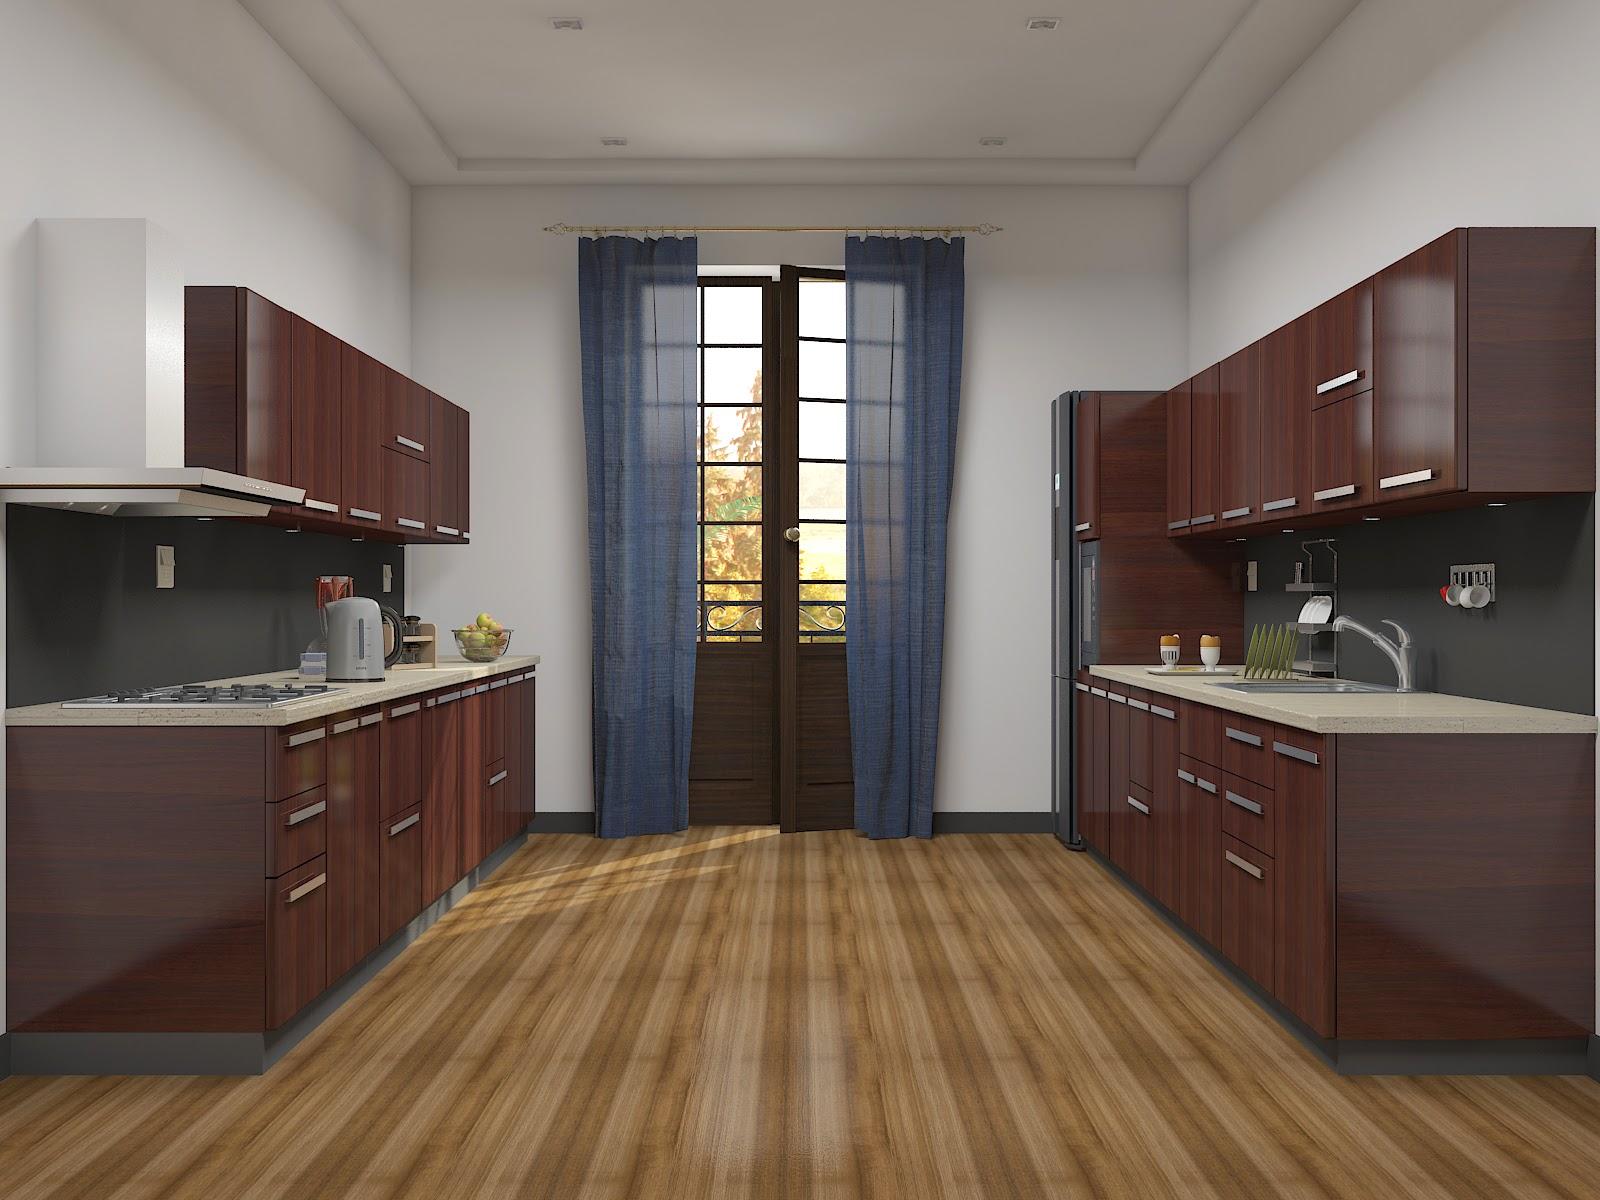 Pin modular kitchen estimate in india on pinterest for Parallel modular kitchen designs india